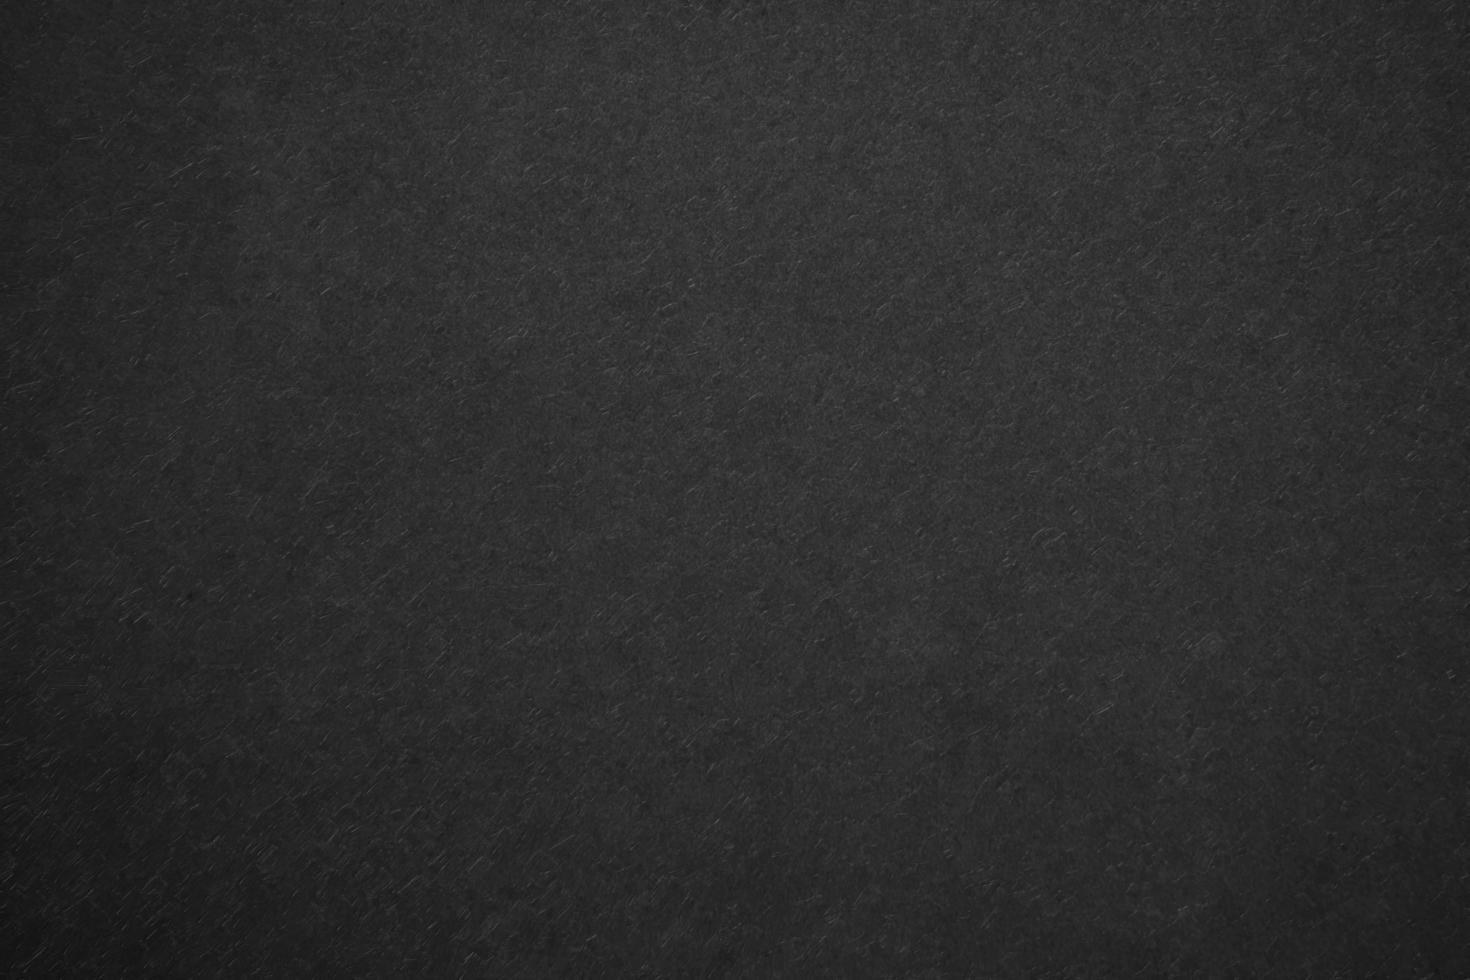 zwarte canvas getextureerde abstracte achtergrond. foto